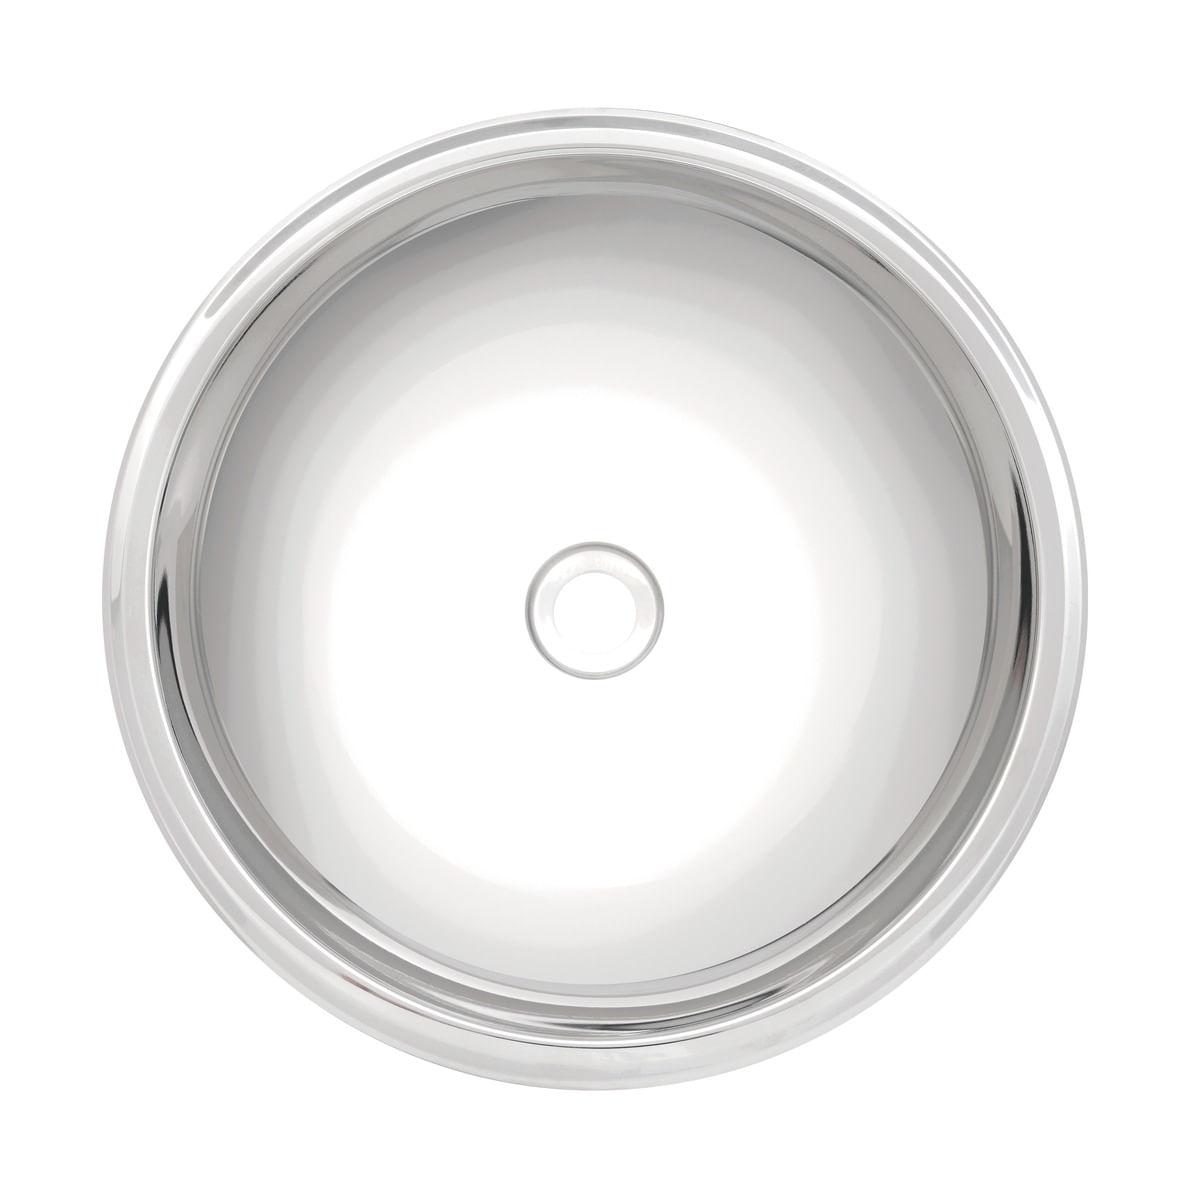 Lavabo Tramontina Redonda em Aço Inox Alto Brilho 34 cm